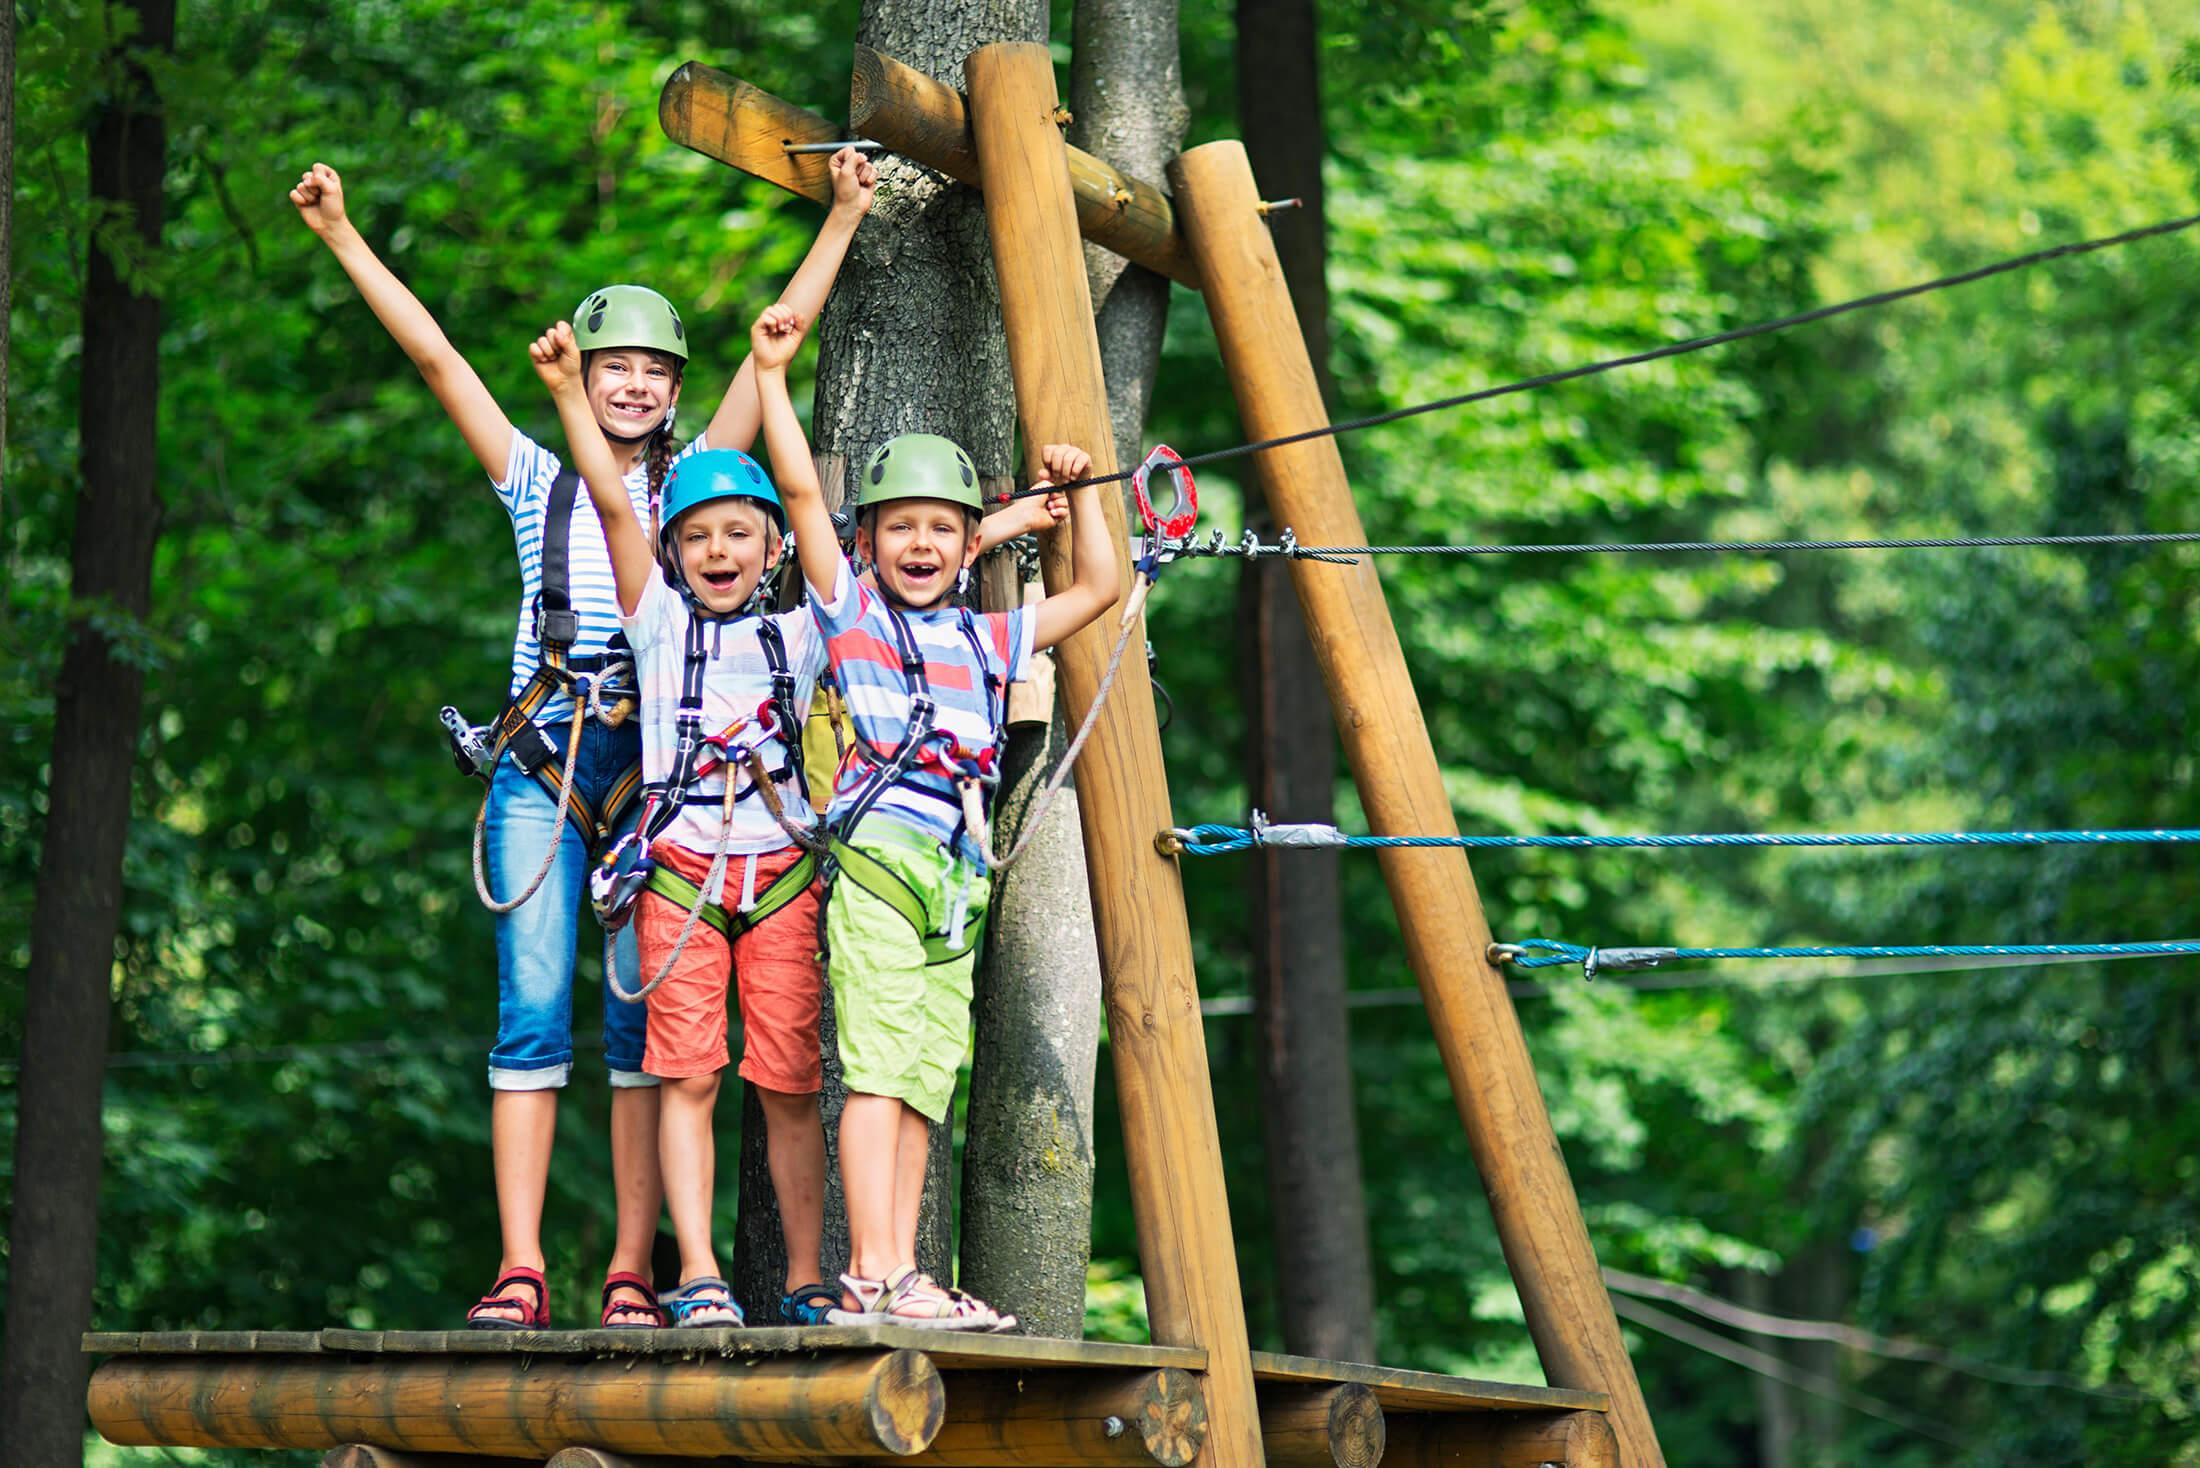 Kids doing tree clim activity